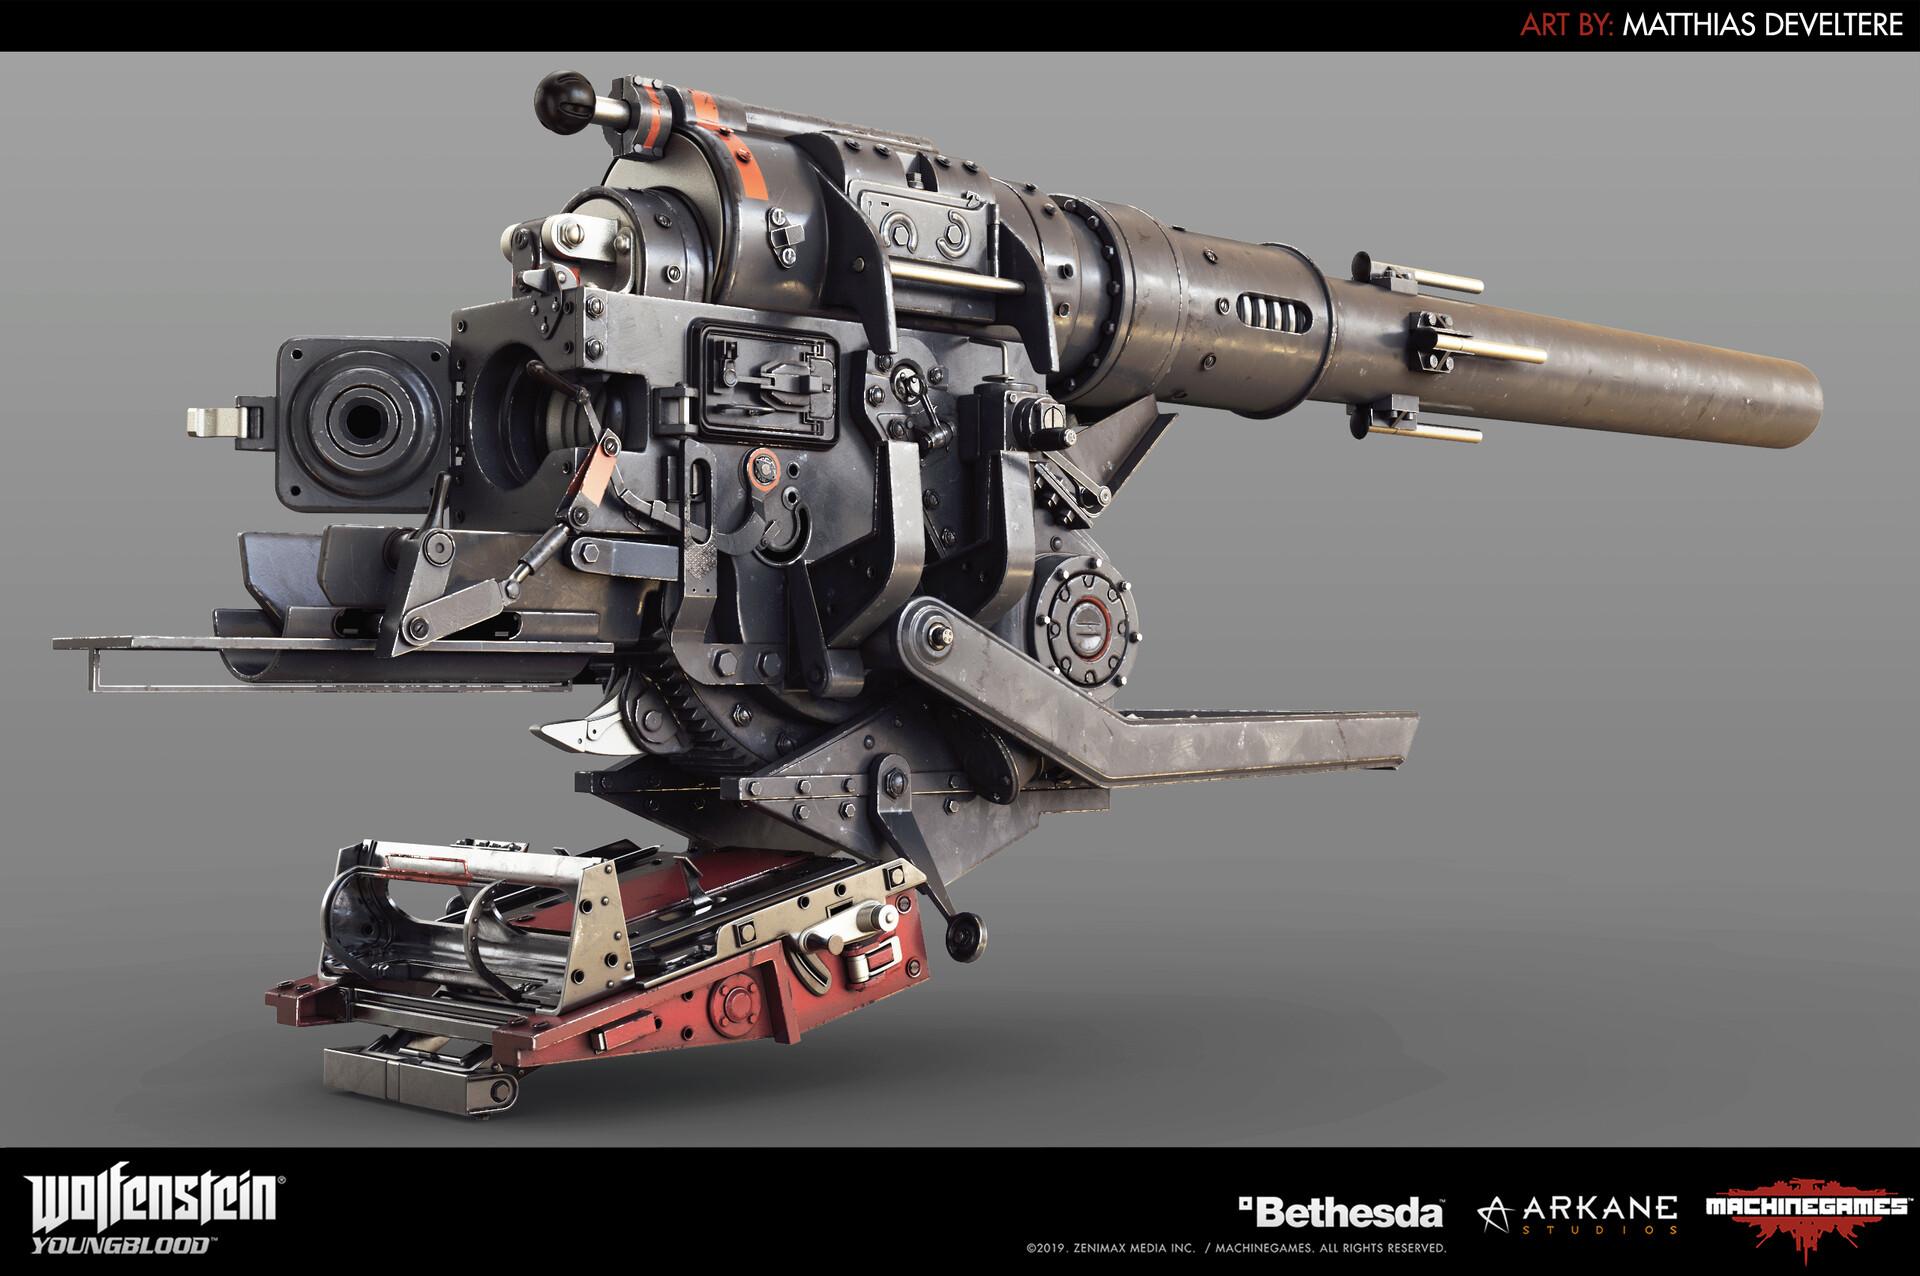 Matthias develtere artillery